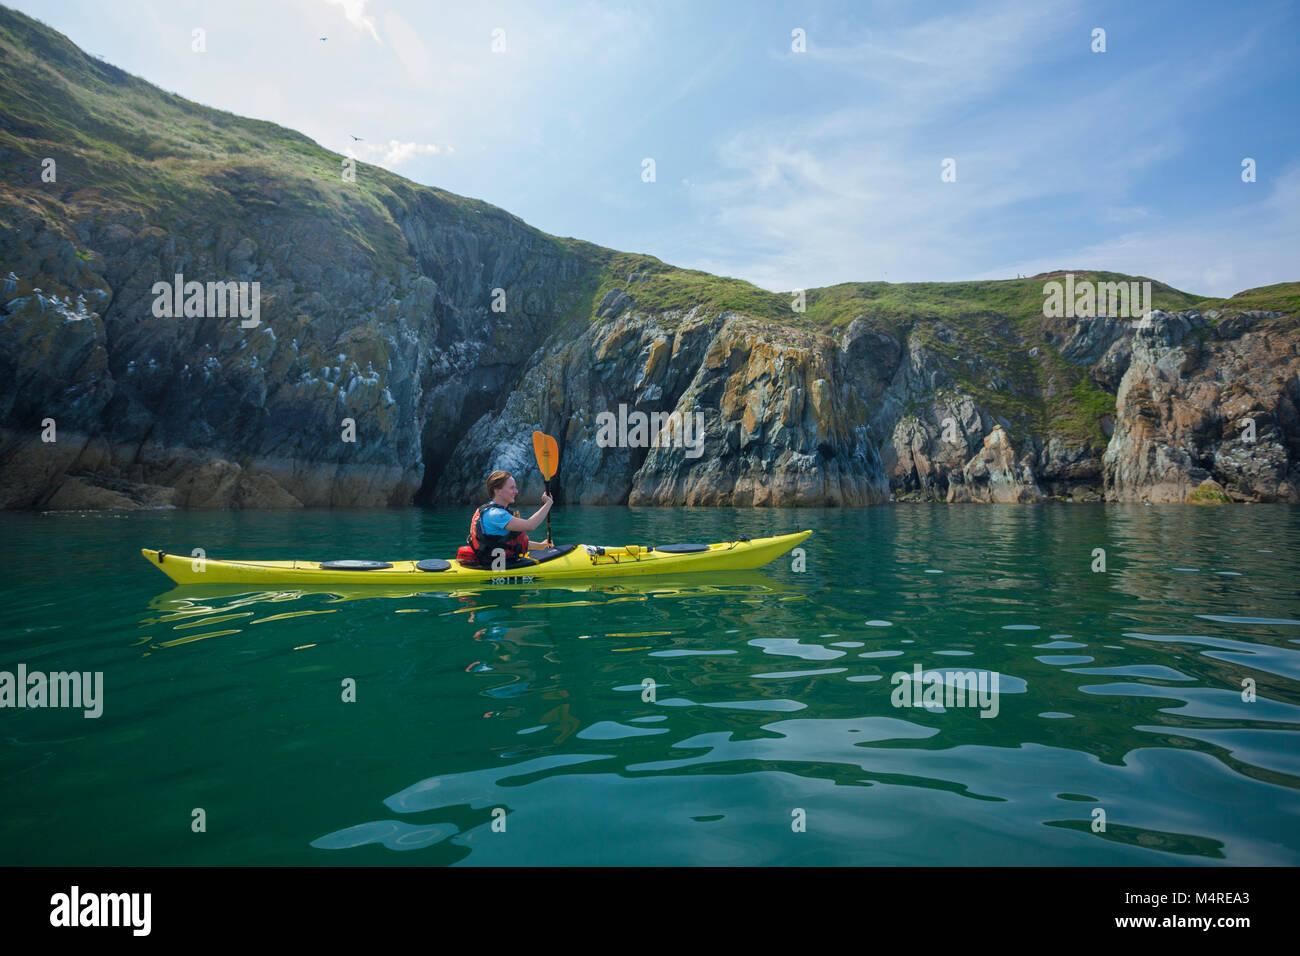 Sea kayaker beneath the cliffs of Howth Head, County Dublin, Ireland. - Stock Image